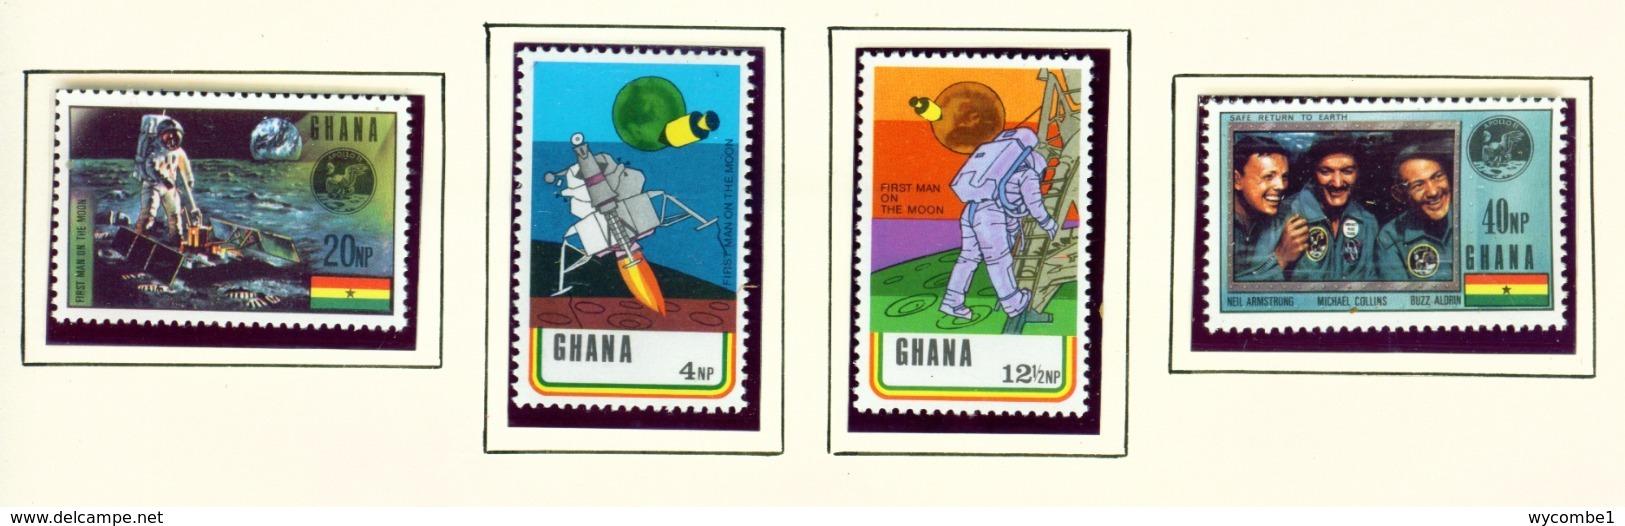 GHANA  -  1970 Moon Landing Set Unmounted/Never Hinged Mint - Ghana (1957-...)